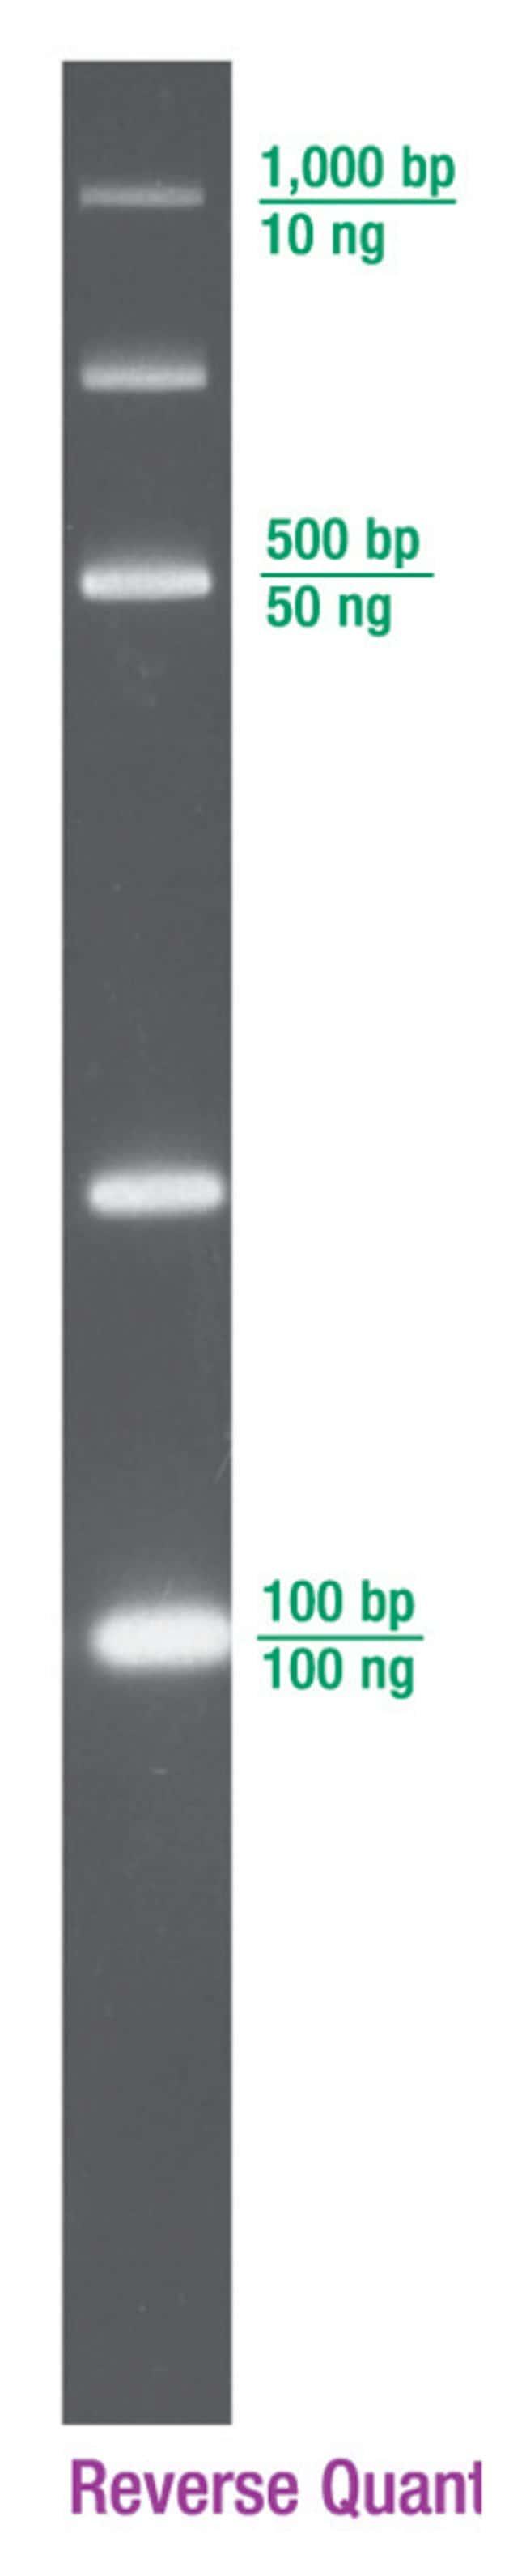 Lonza DNA QuantLadders:Life Sciences:Biochemicals and Reagents